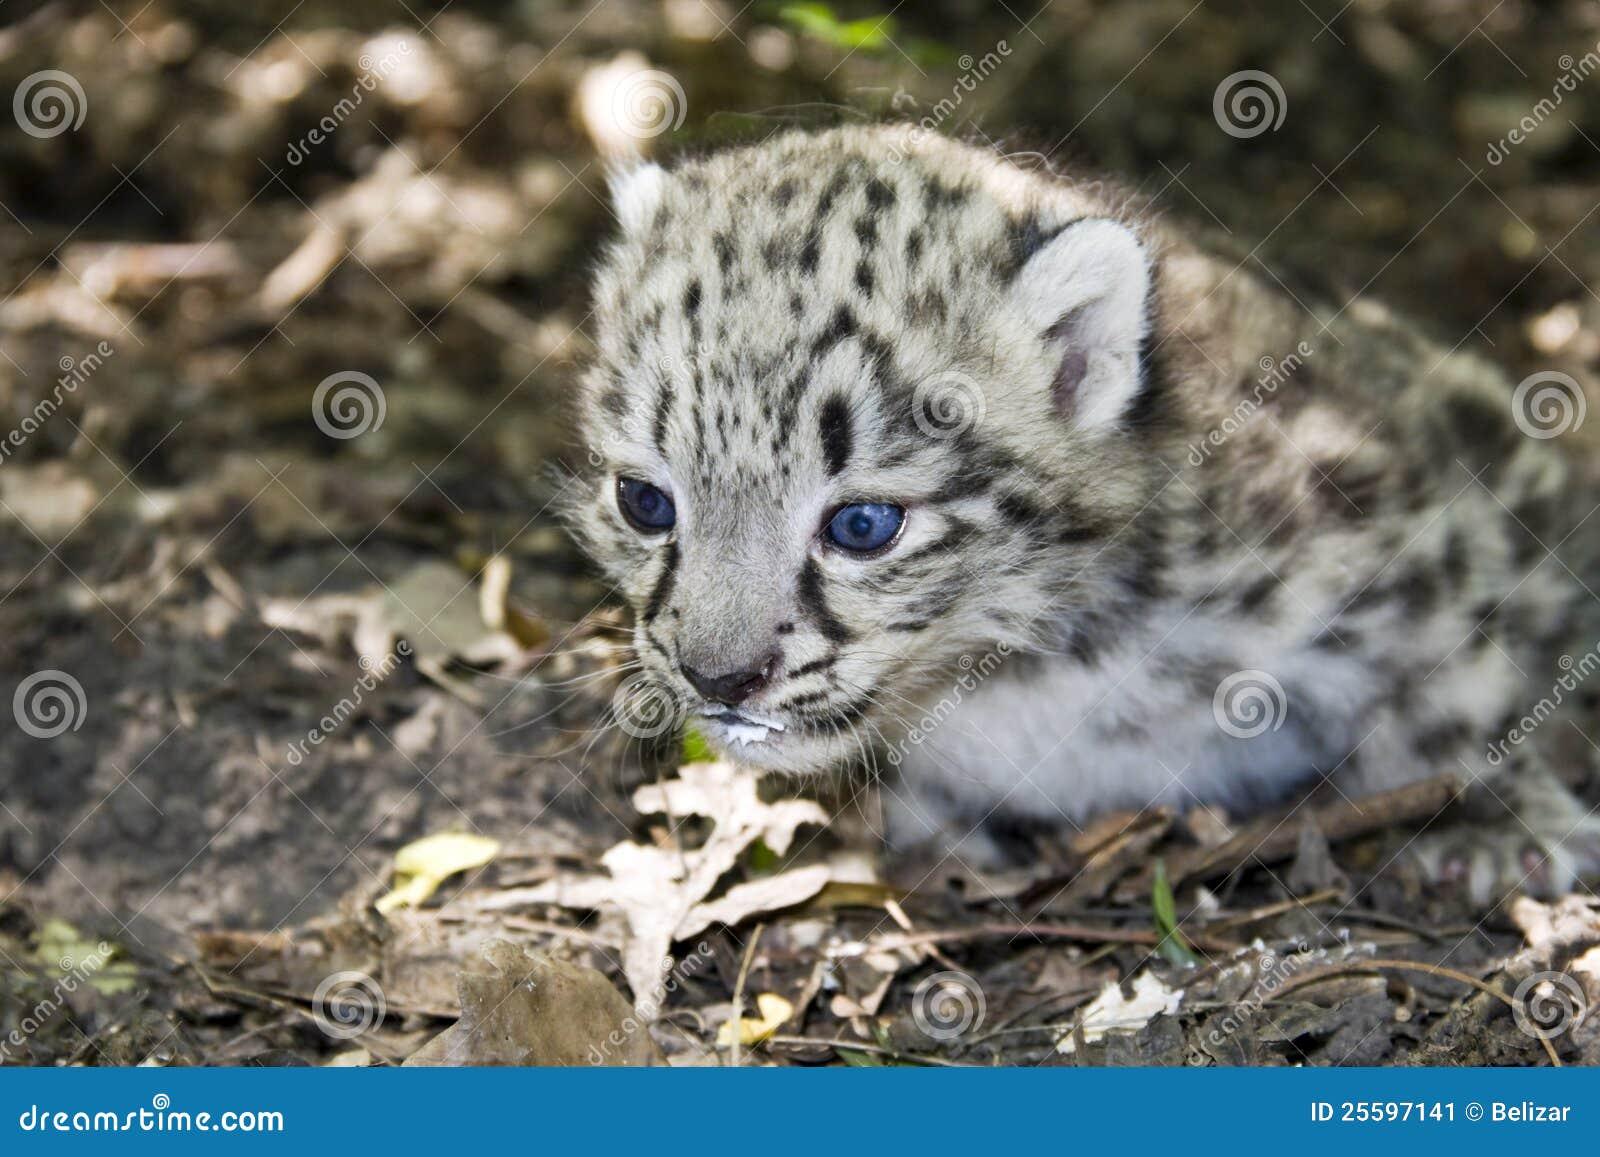 Baby white leopard - photo#12